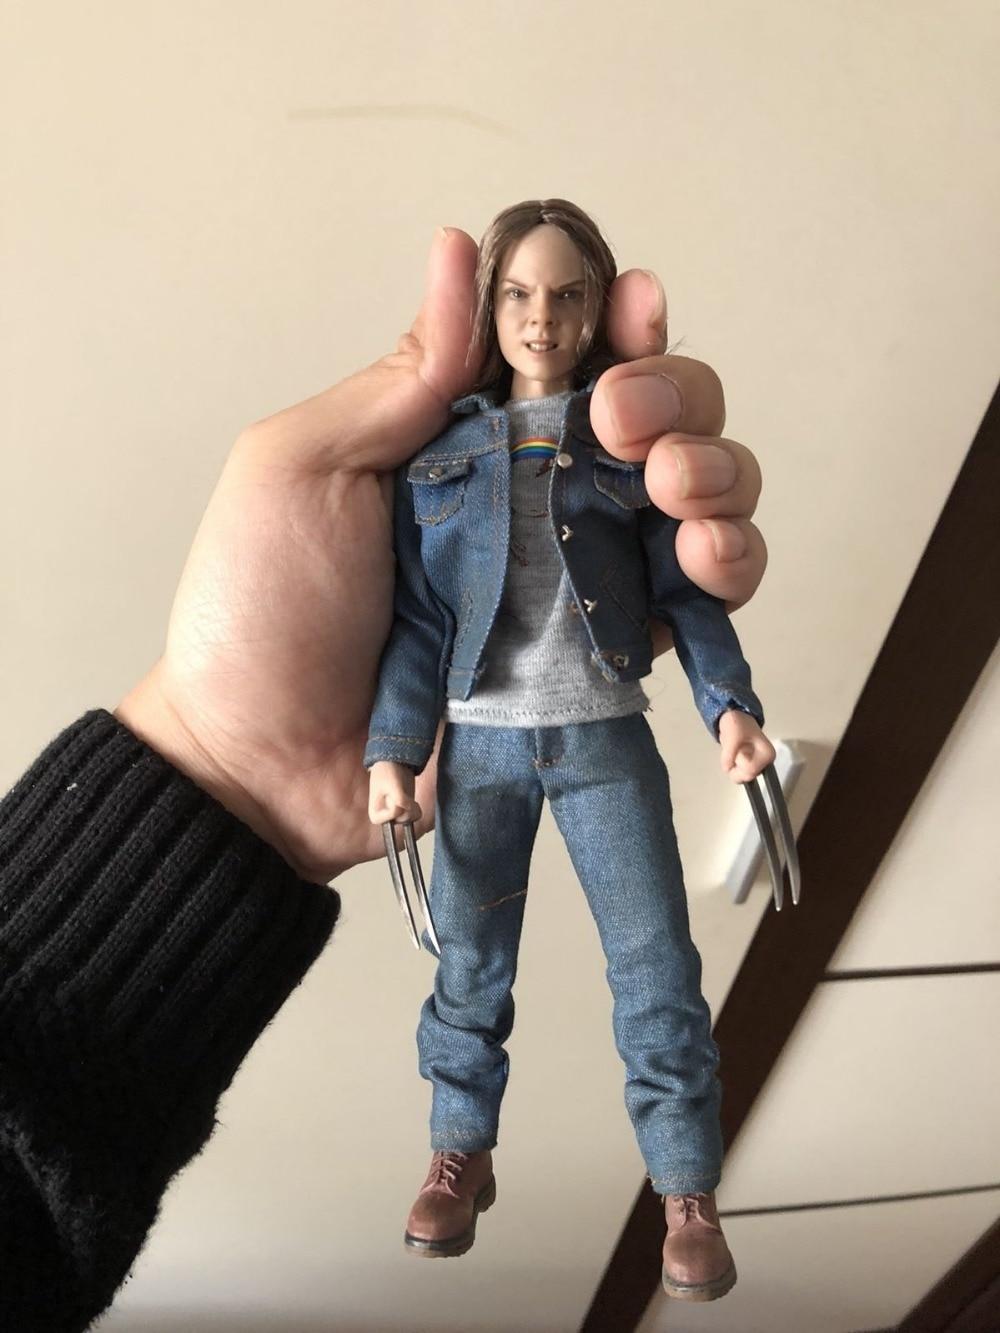 Asmus Toys THE LAURA 2.0 SET TEENAGER BODY 3.0 Female Head 1//6 Figure Full SET